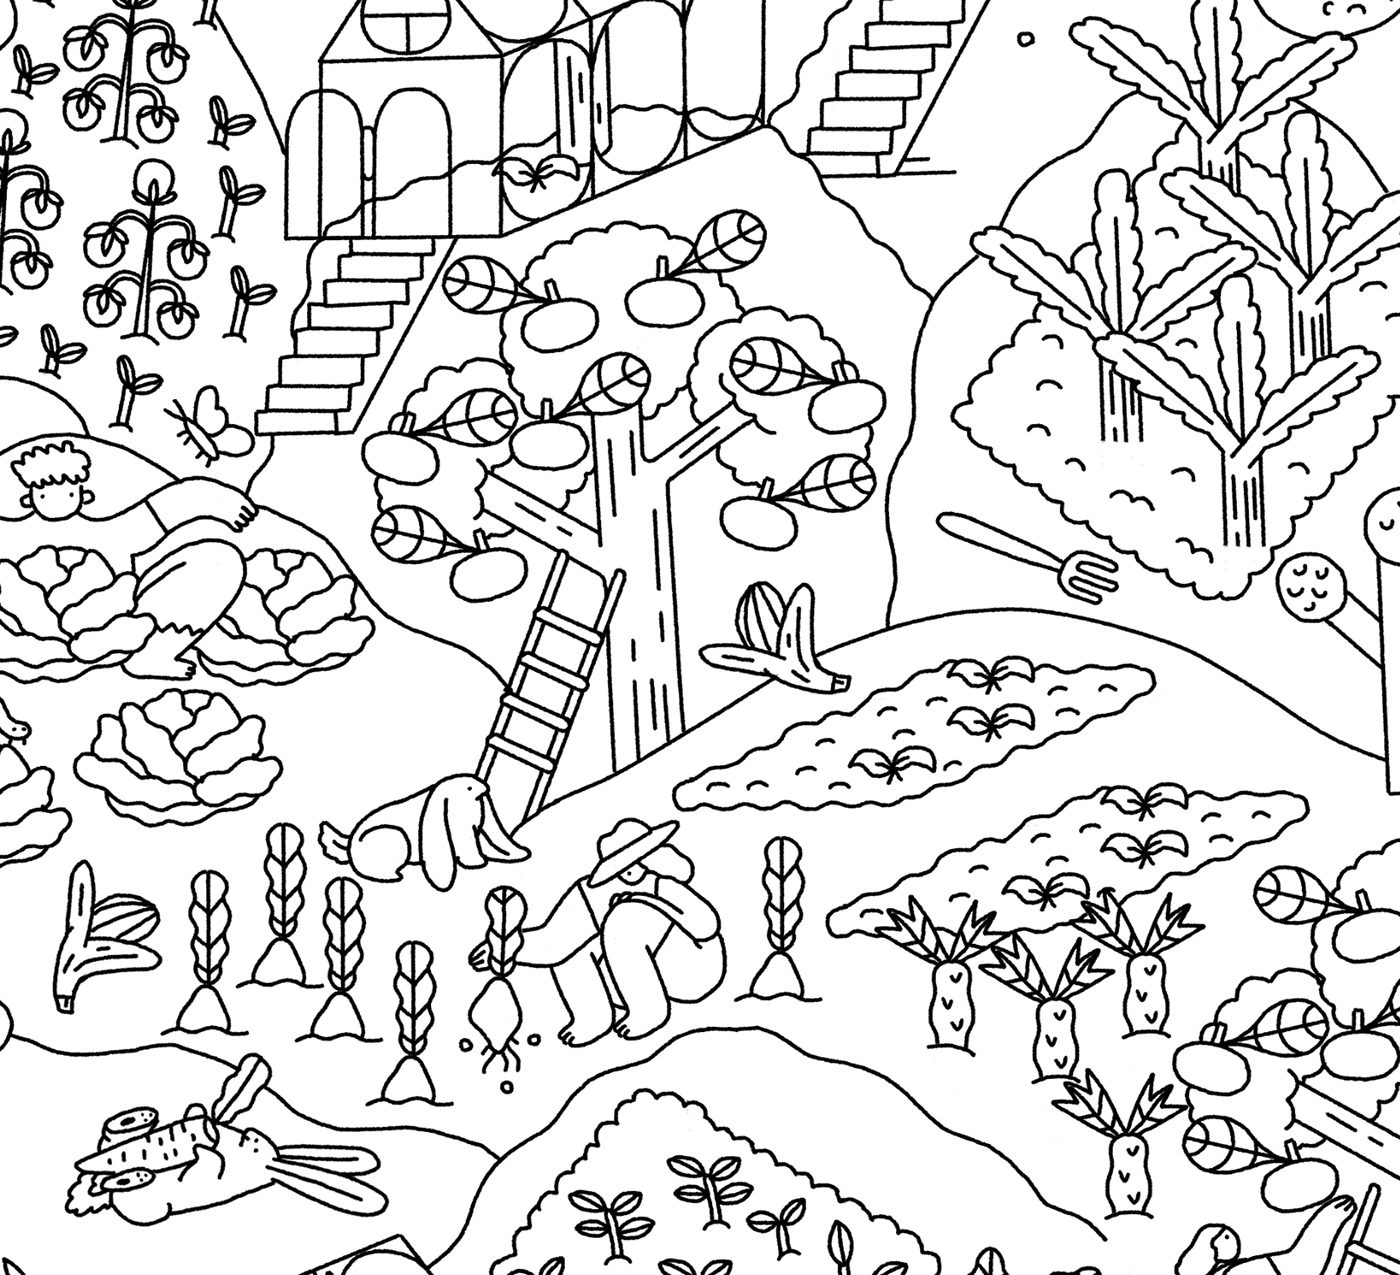 Image may contain: map, drawing and cartoon